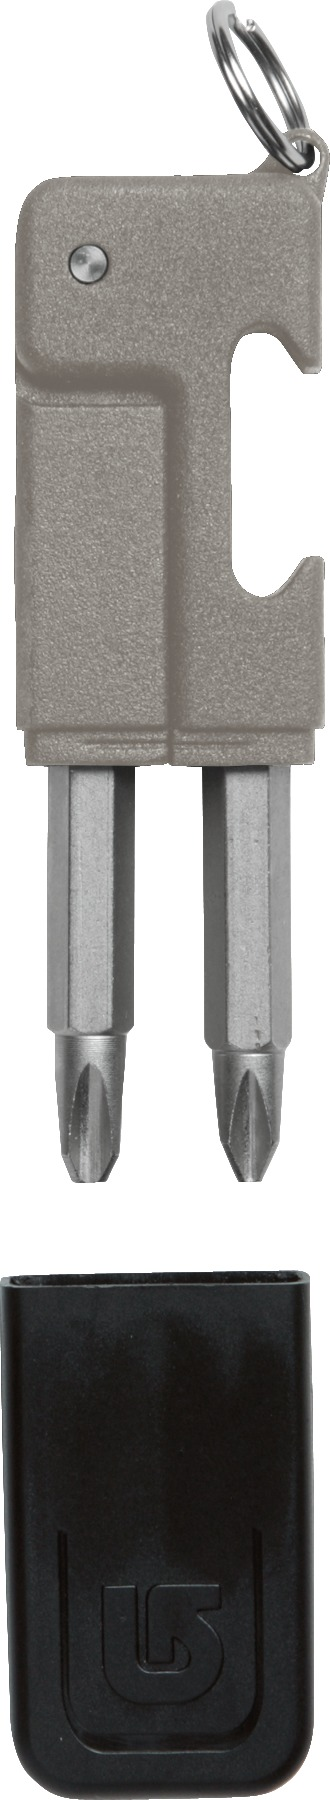 Klucz Burton Est Tool (Gunmetal/Black)